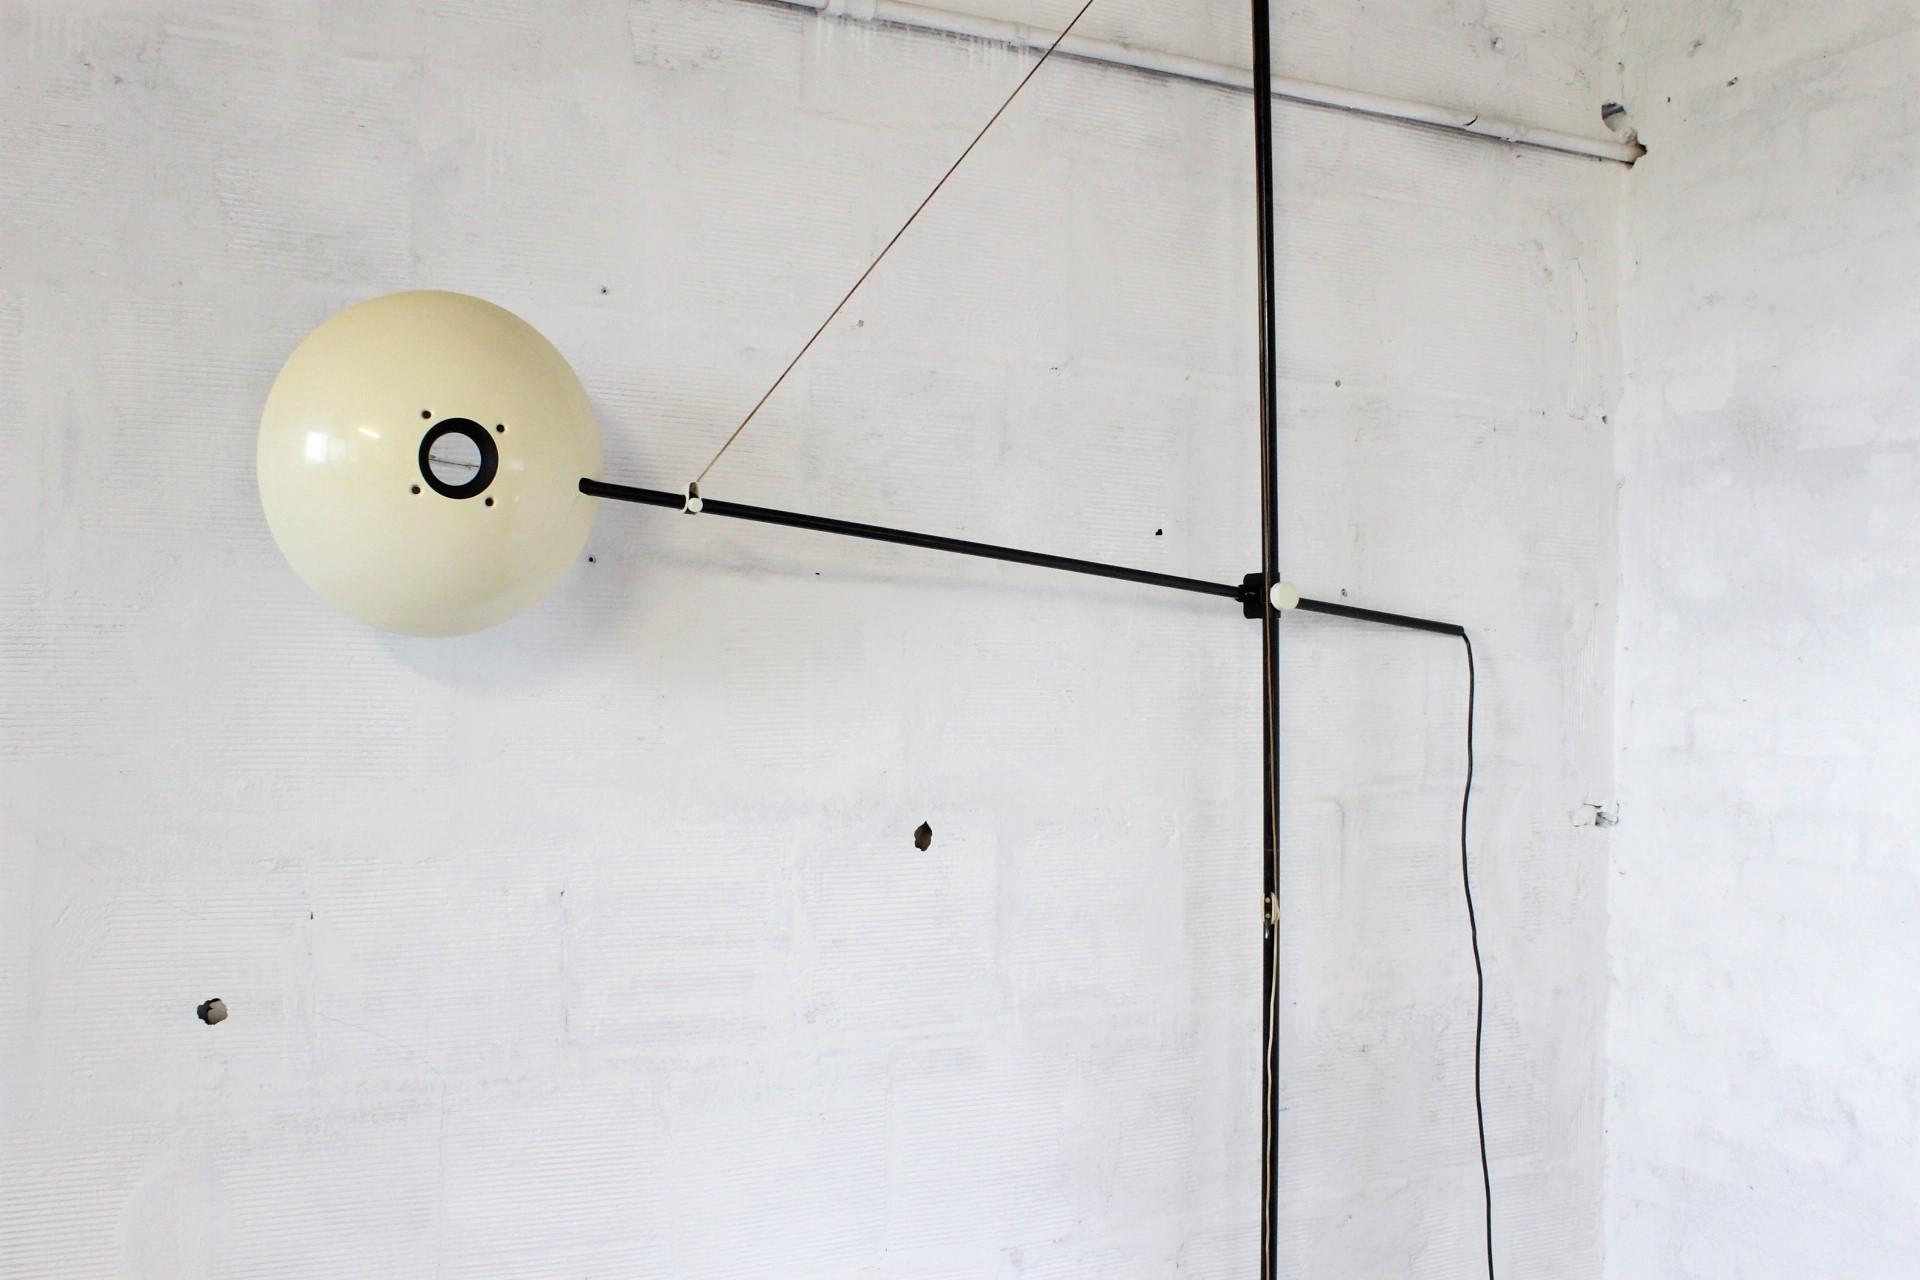 Vintage Bigo Ceiling Lamp Floor By Valenti Luce 1970s